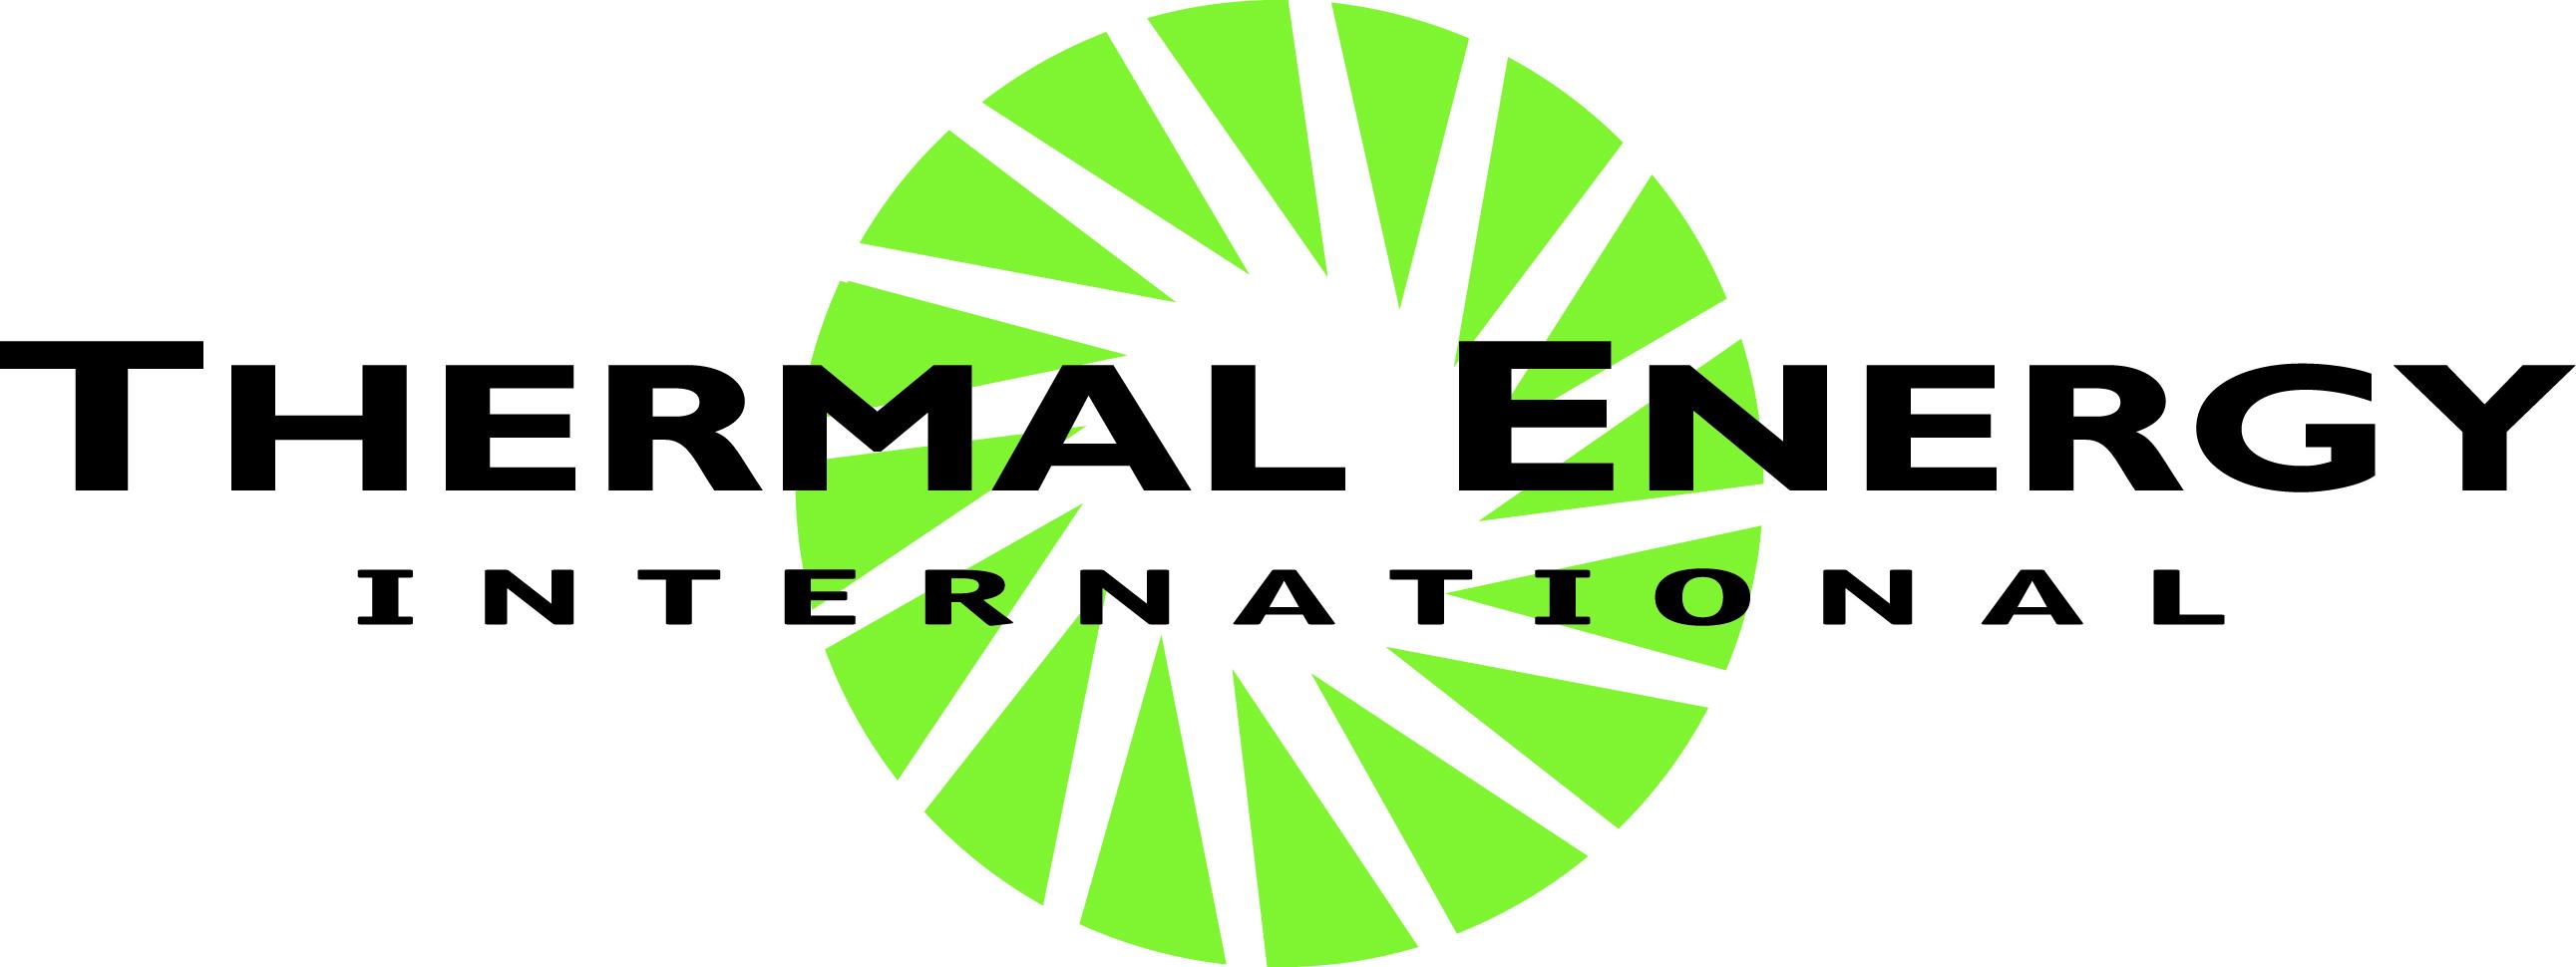 FMA Summits: Thermal Energy